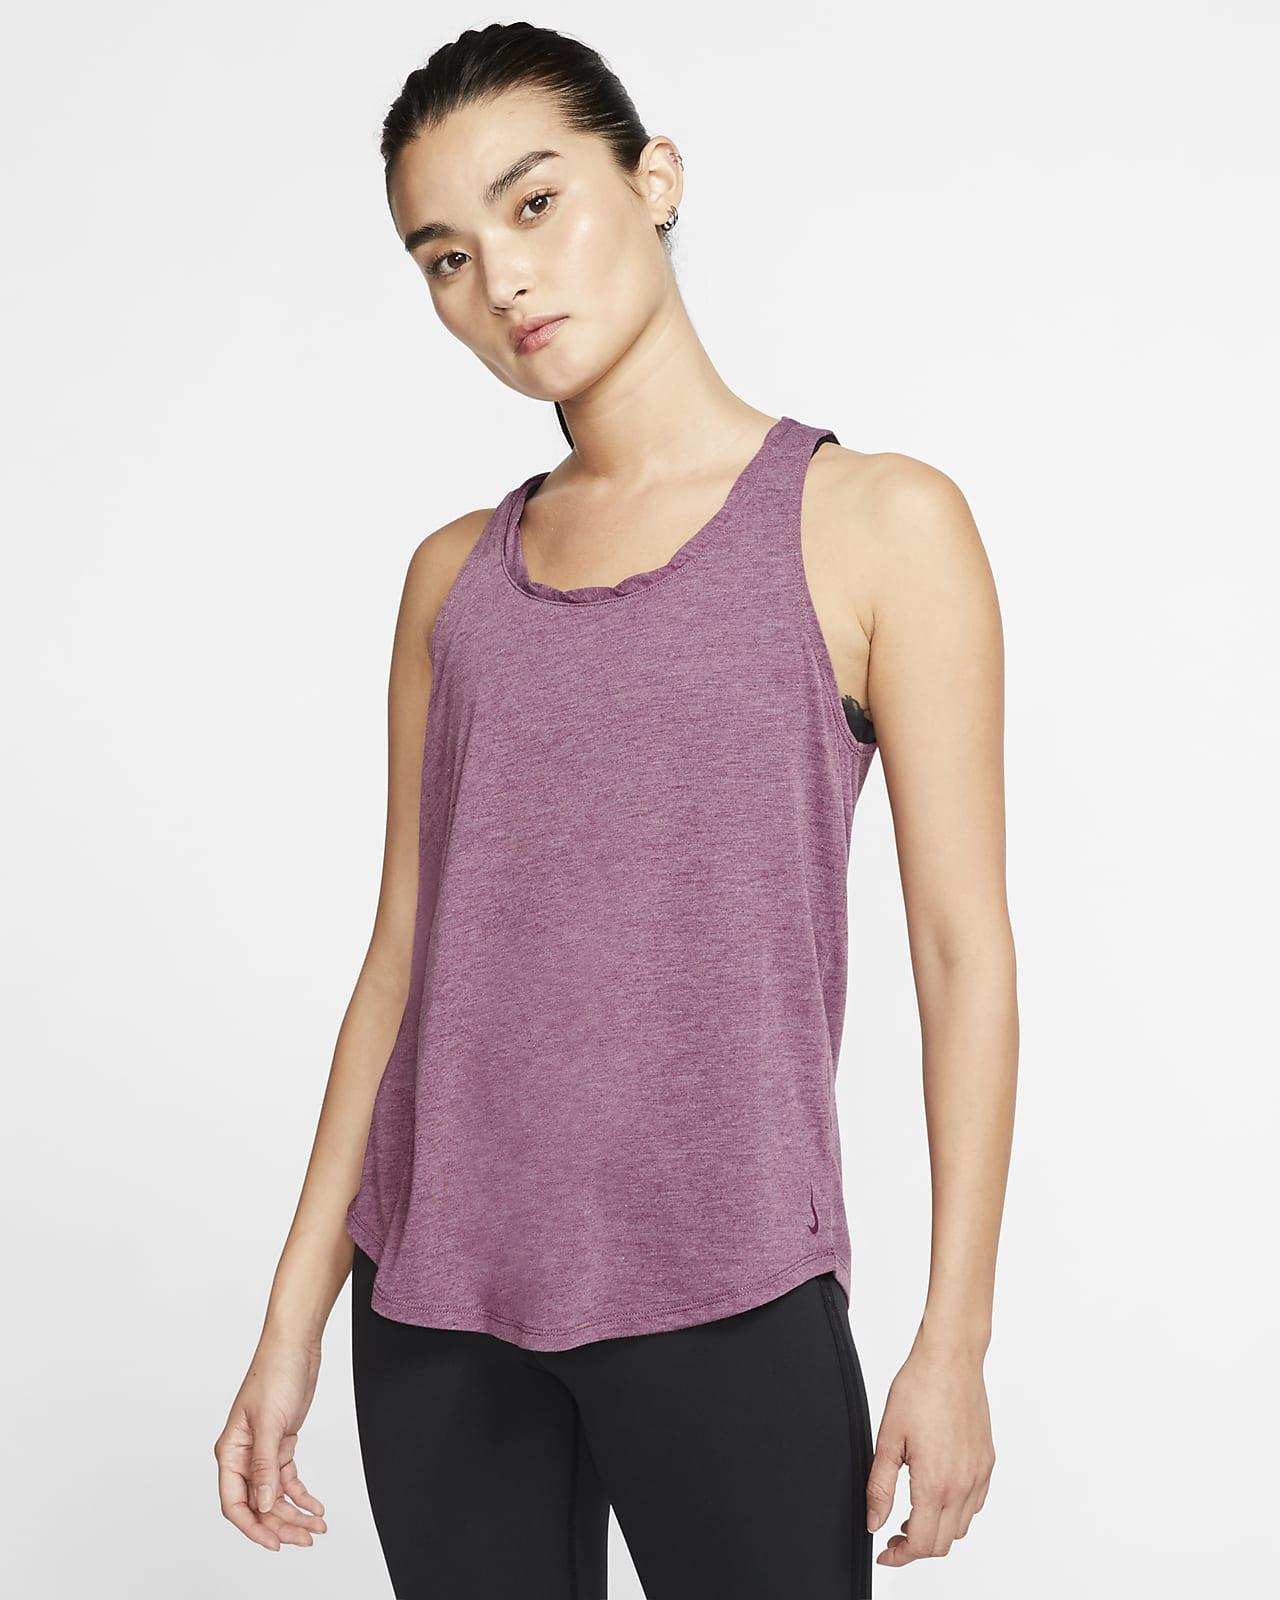 Nike Yoga Women's Training Tank